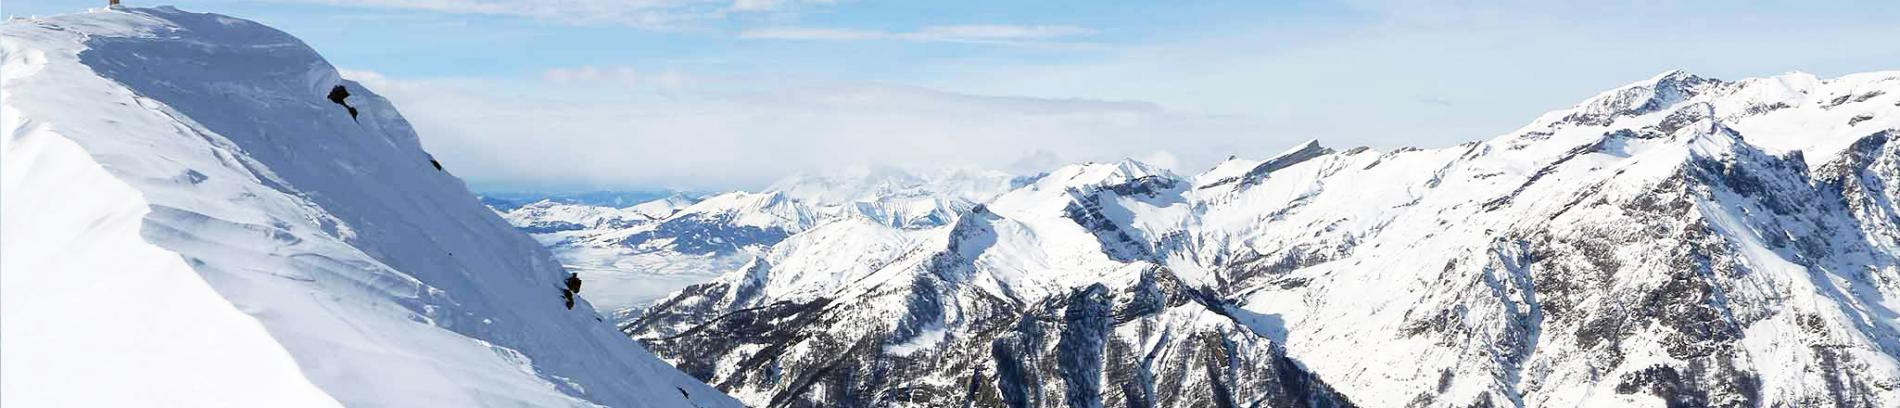 Slide paysage de montagne